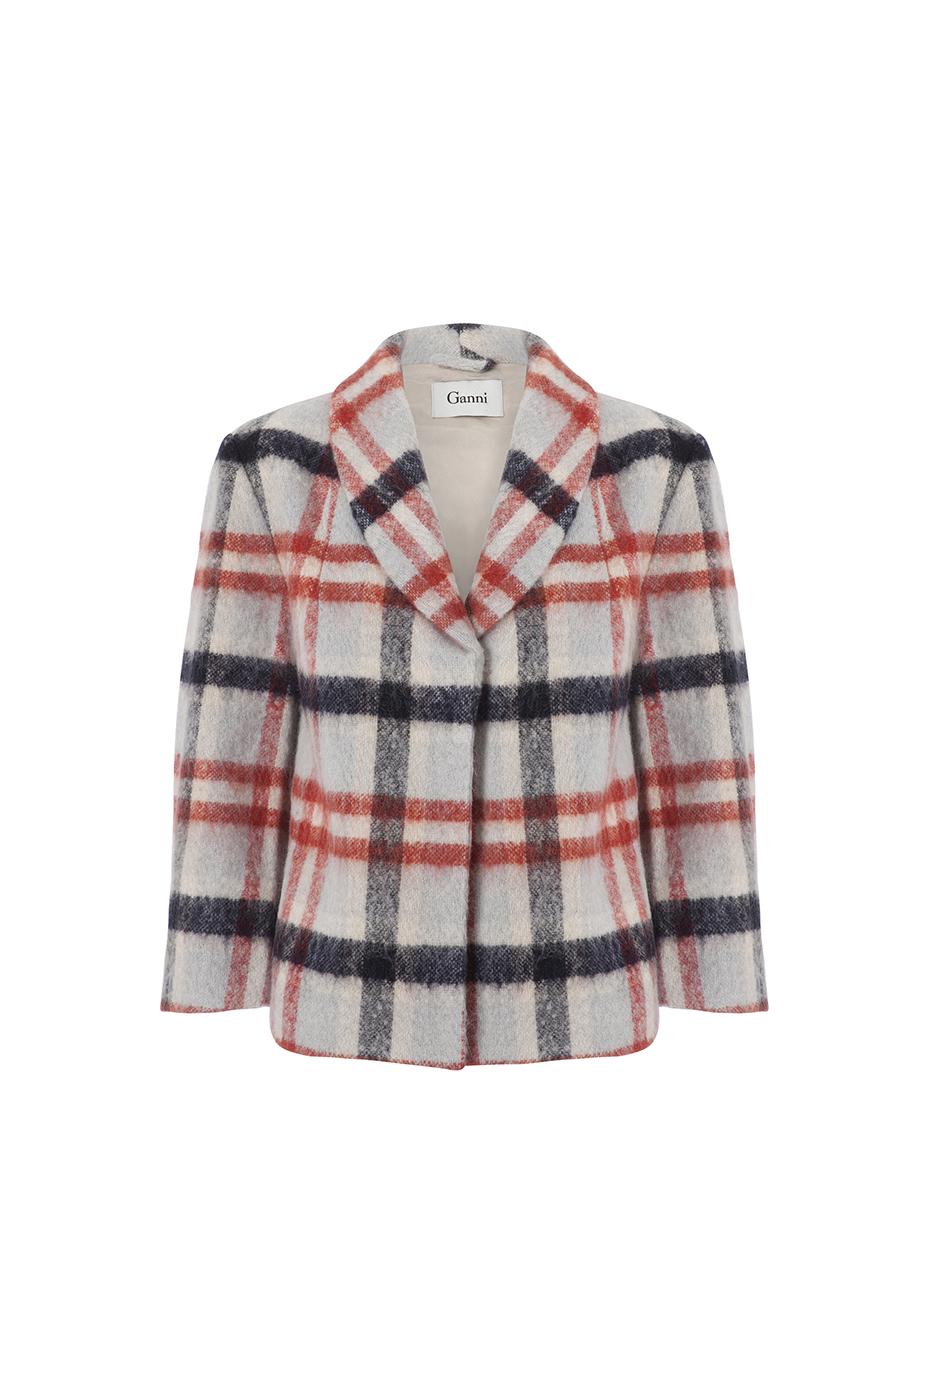 Blazers & Jackets > Jacket